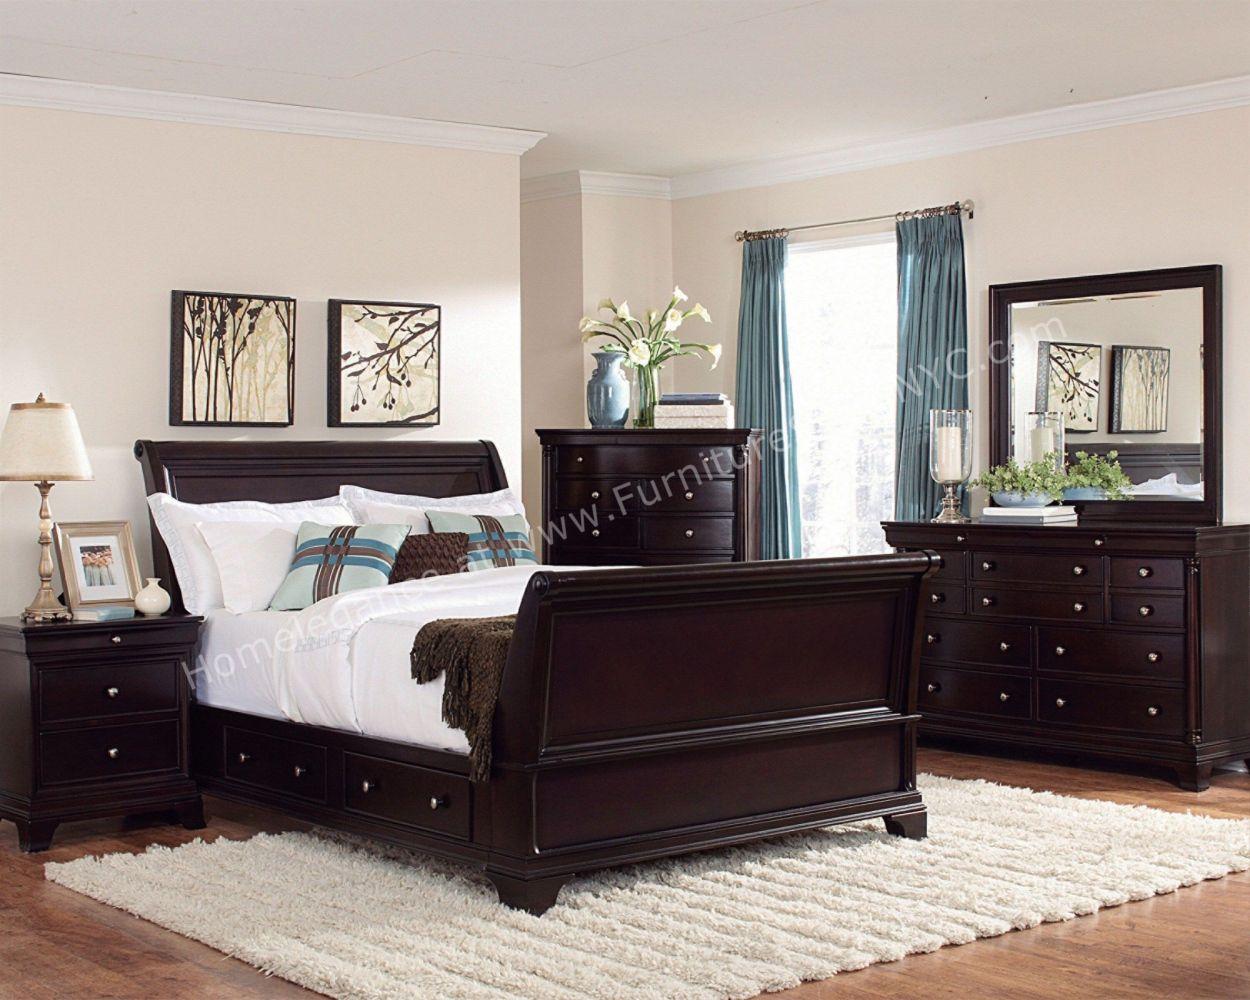 Dark Cherry Wood Bedroom Furniture - Best Quality Furniture Check ...